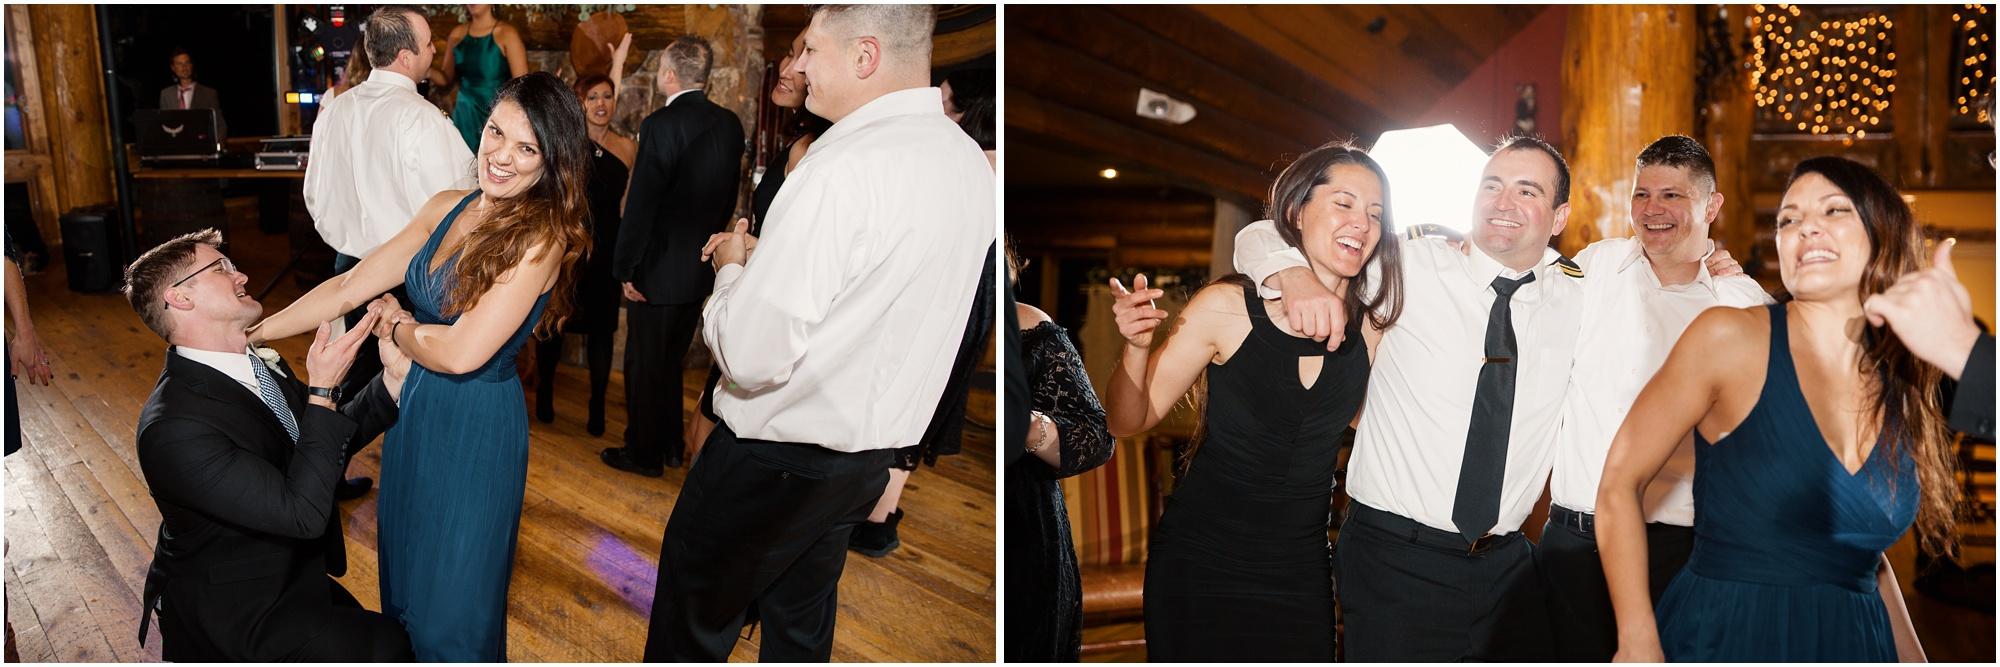 Breckenridge-Wedding-Photographer_0084.jpg